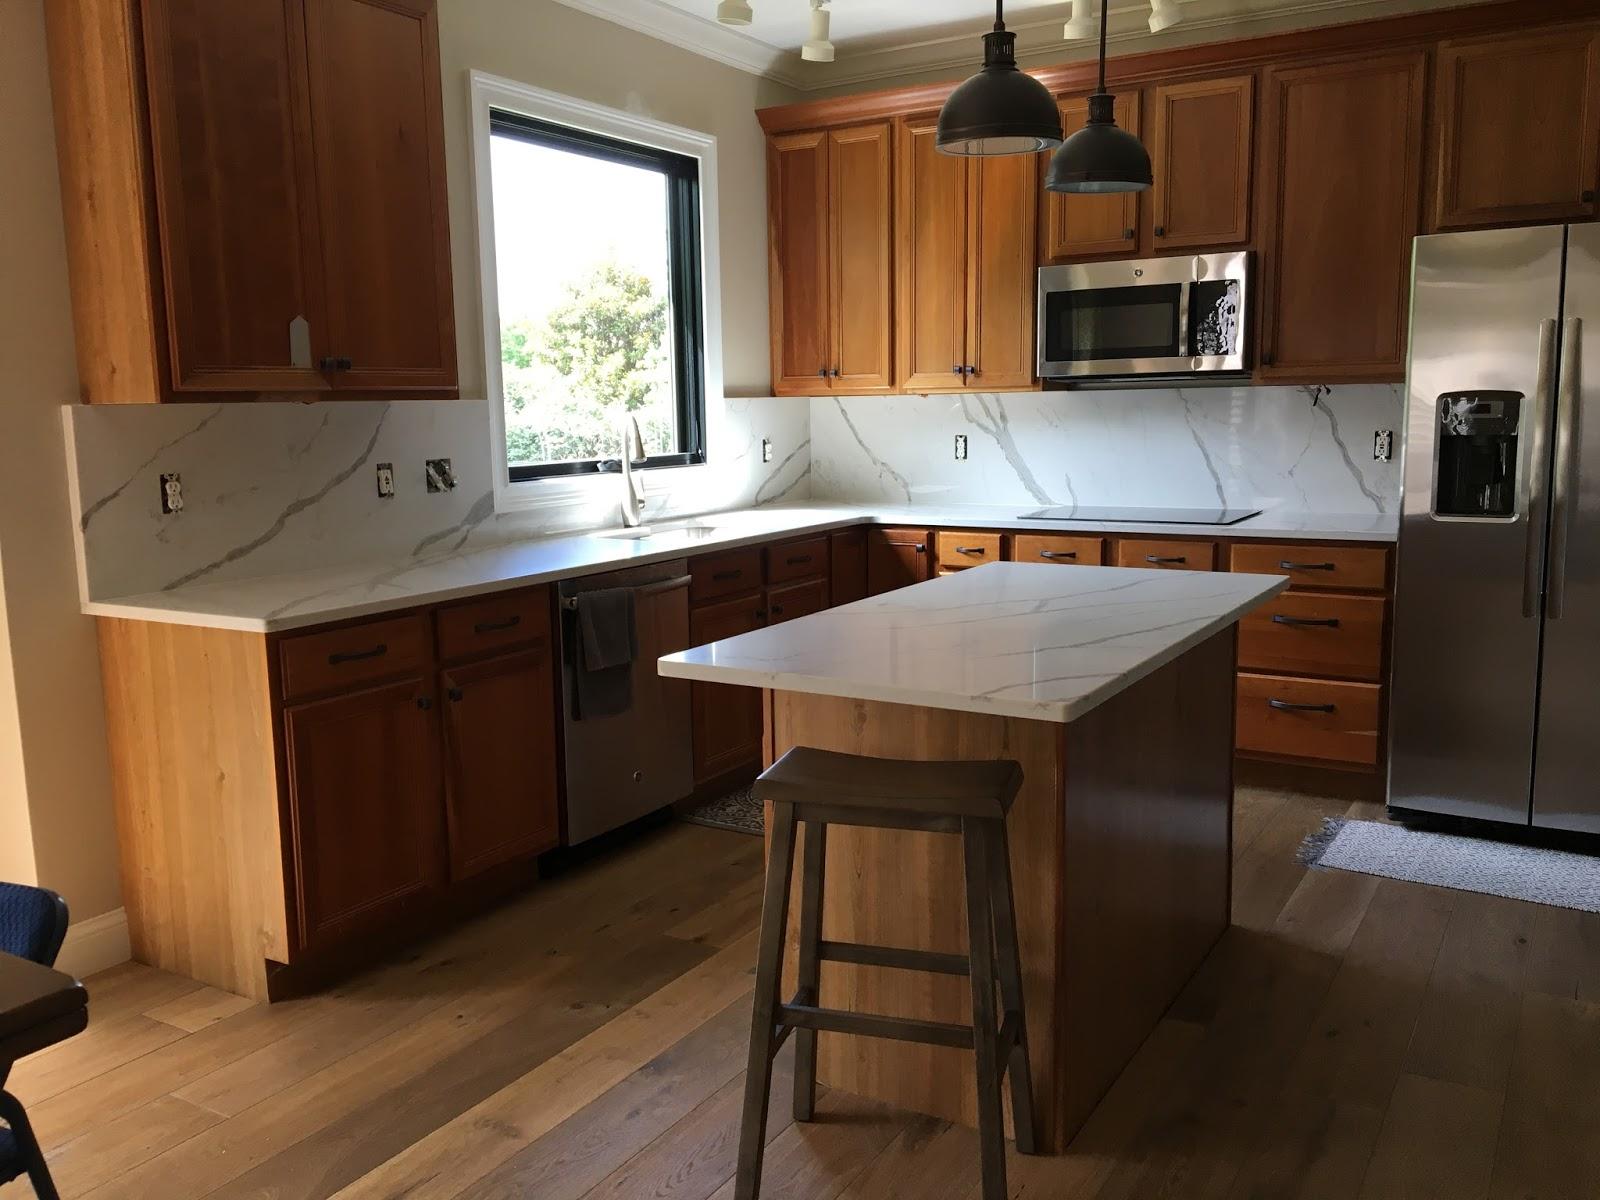 Kitchen Cabinet Refinishing Los Angeles Ca